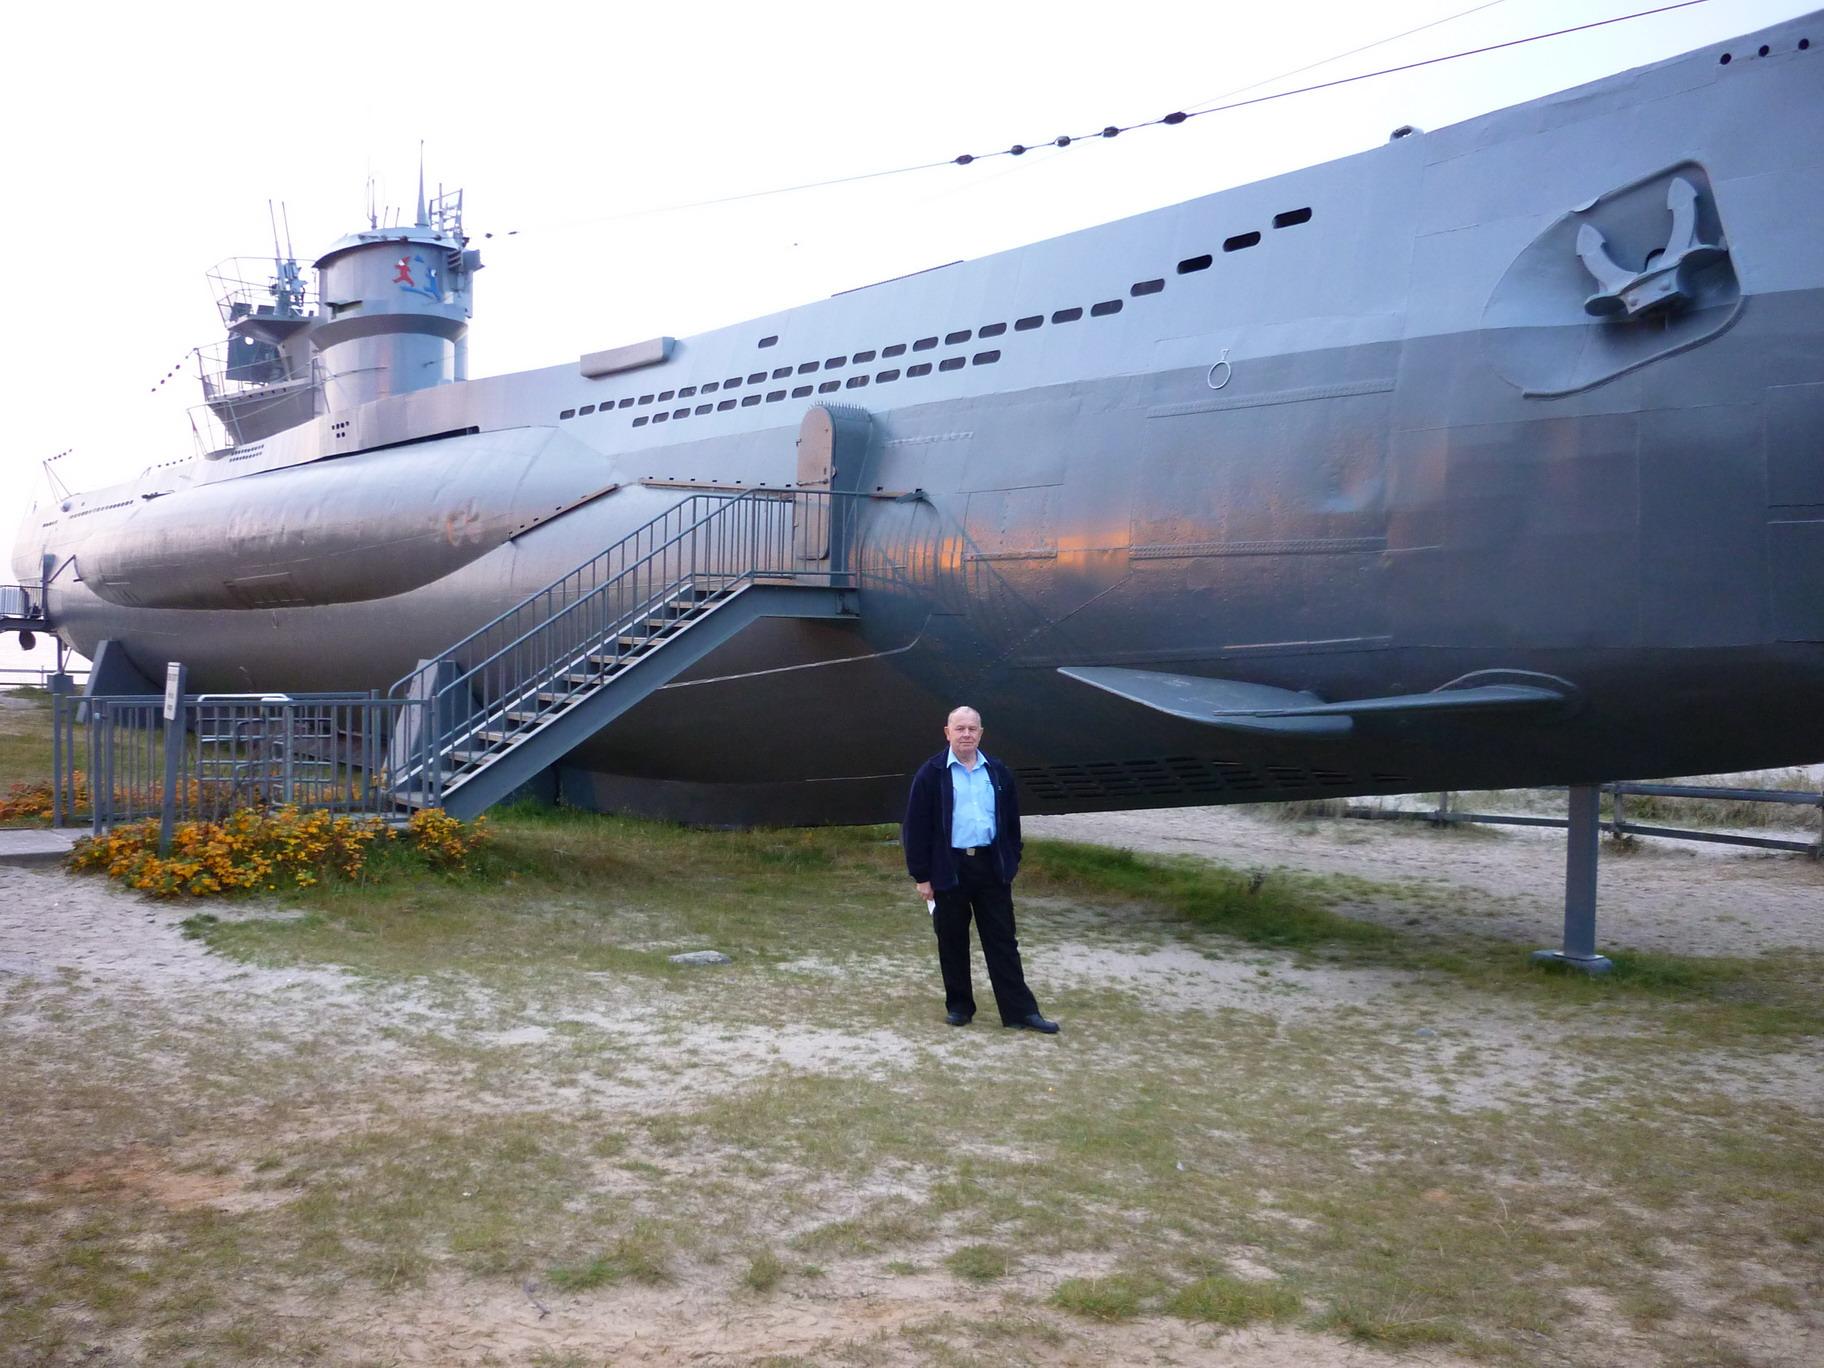 [revell] U-Boot typ VII C/41       au 1/72° U995-Kiel-25_RS